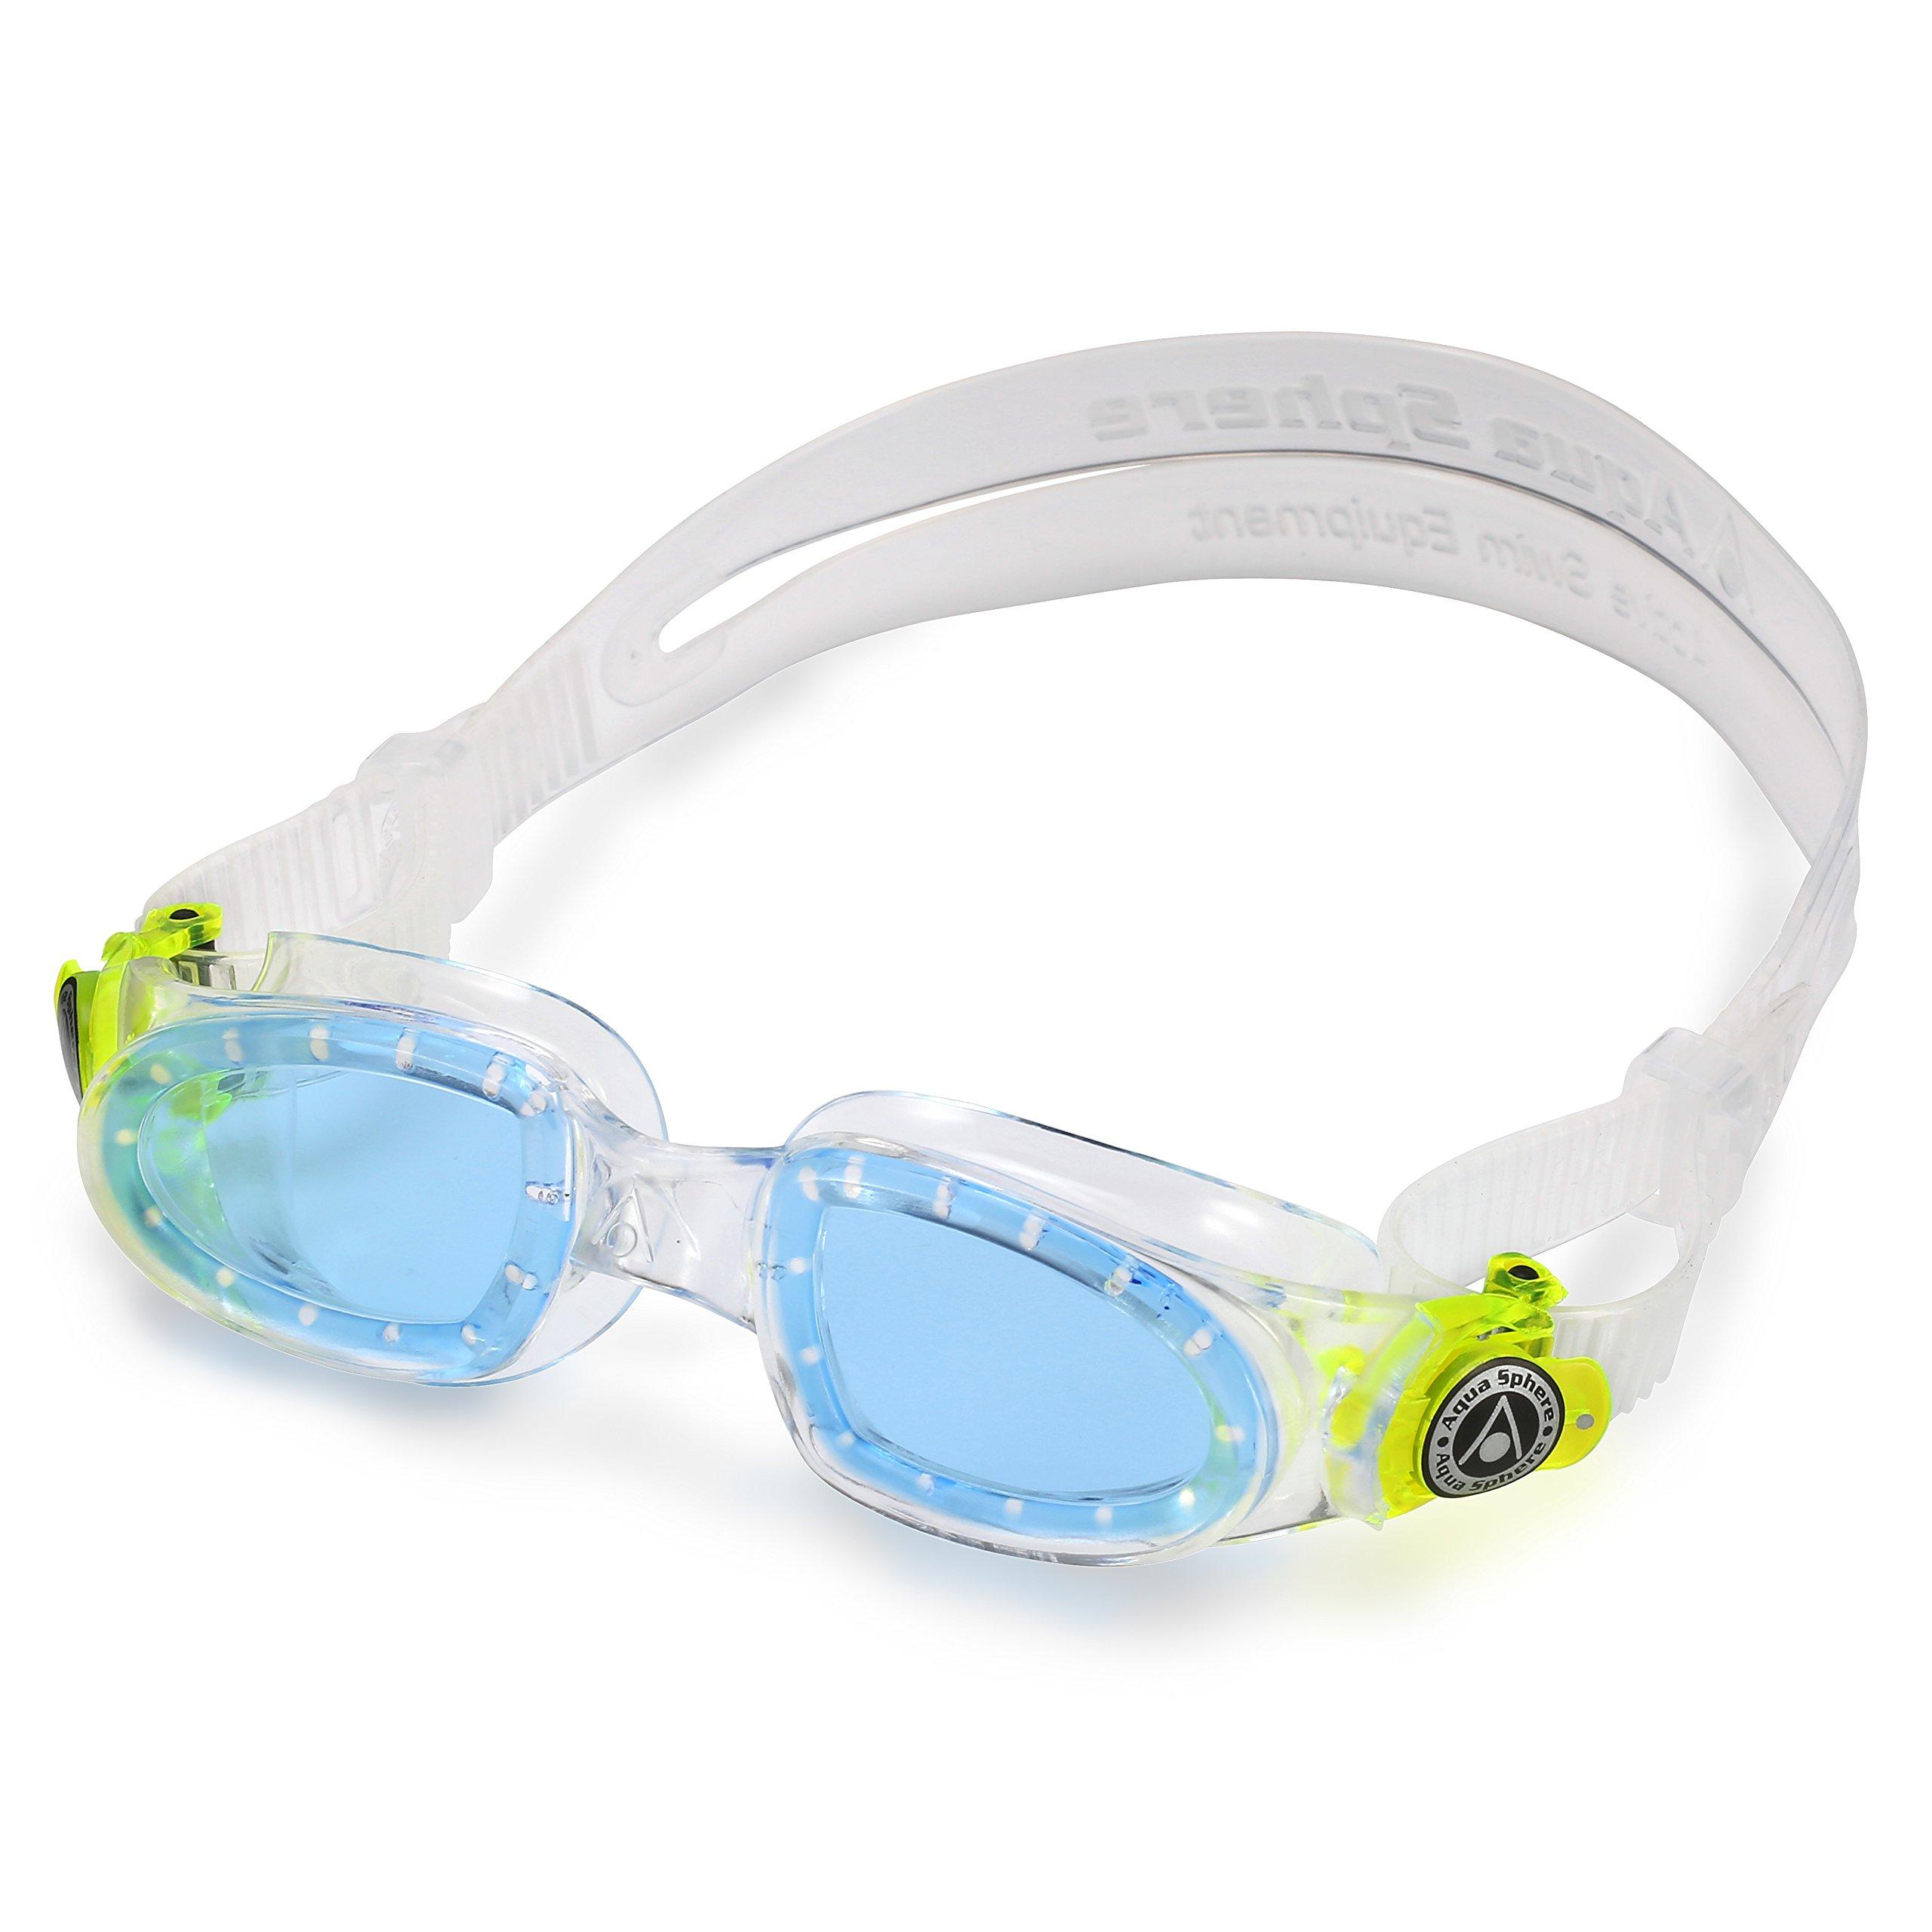 88c3c3e0941 Aqua Sphere Moby Kid Swim Goggle